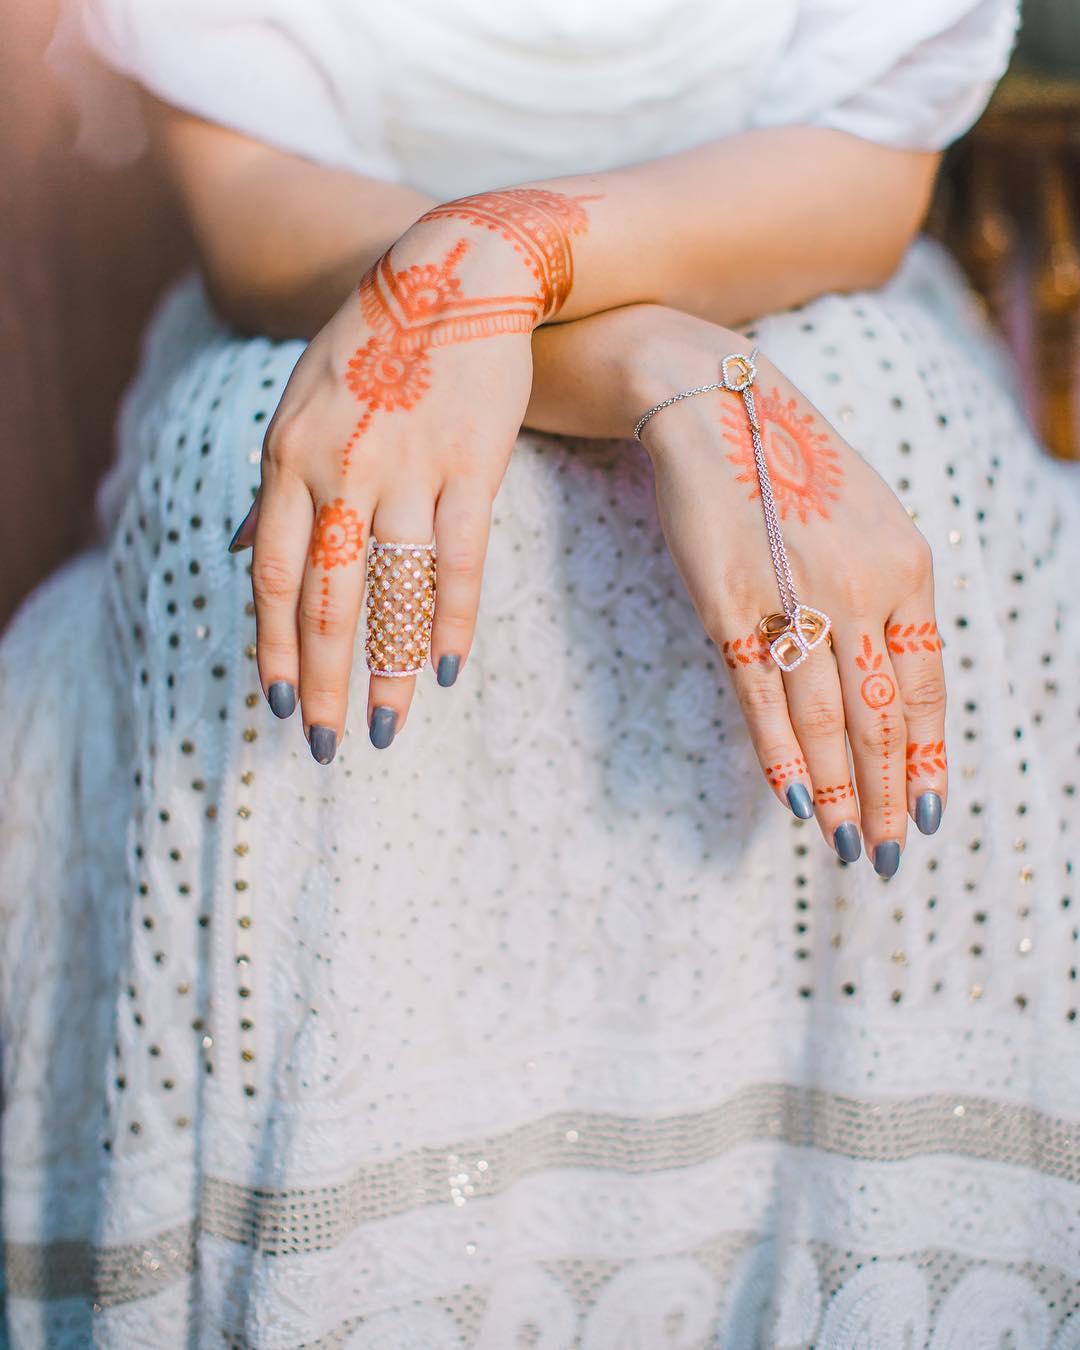 Simple Bridal Mehendi Designs For The Minimalistic Bride S Hands The Urban Guide,Famous British Fashion Designers